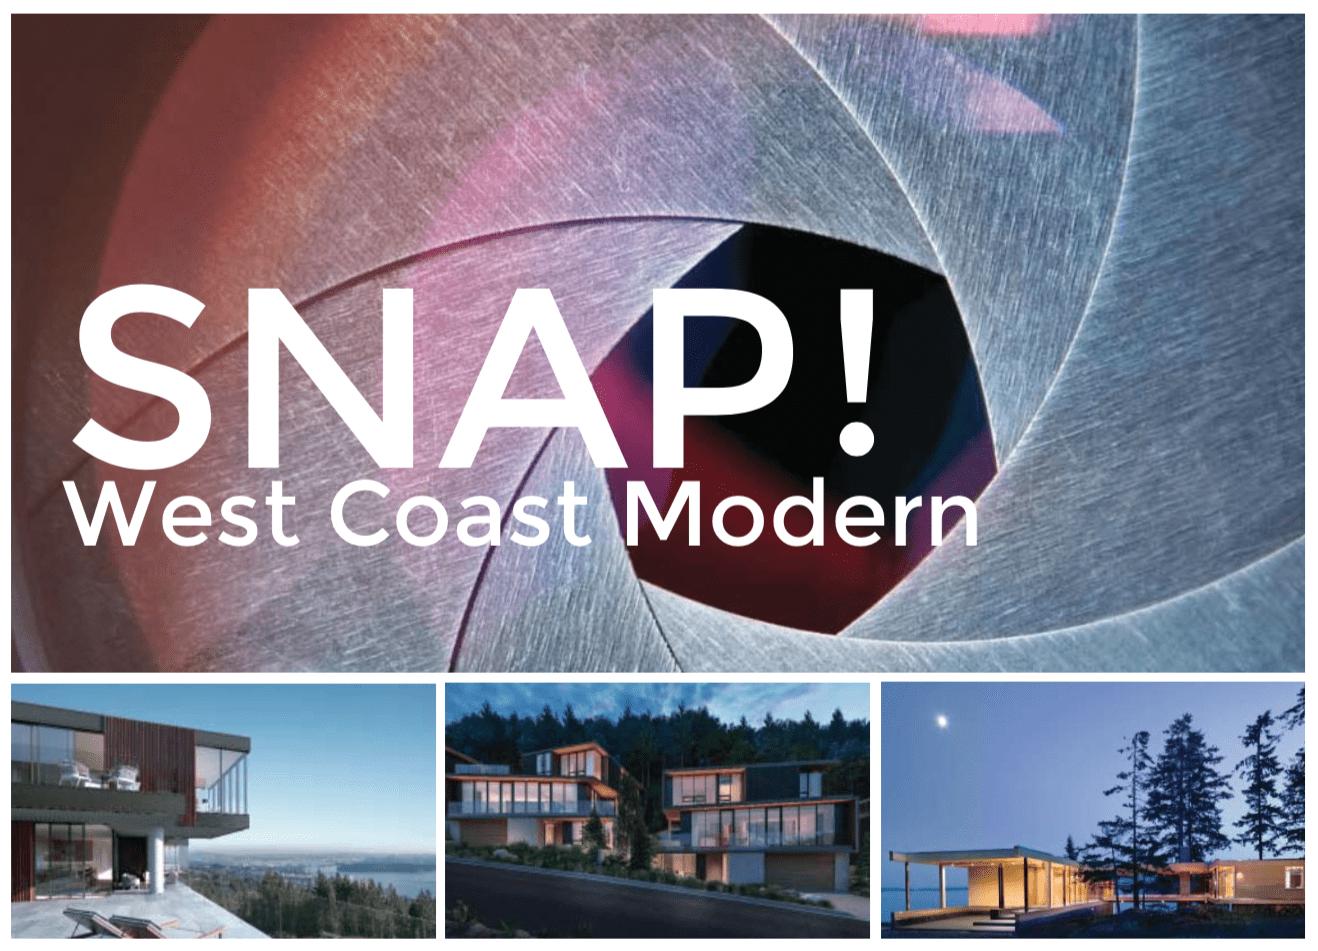 Snap! West Coast Modern